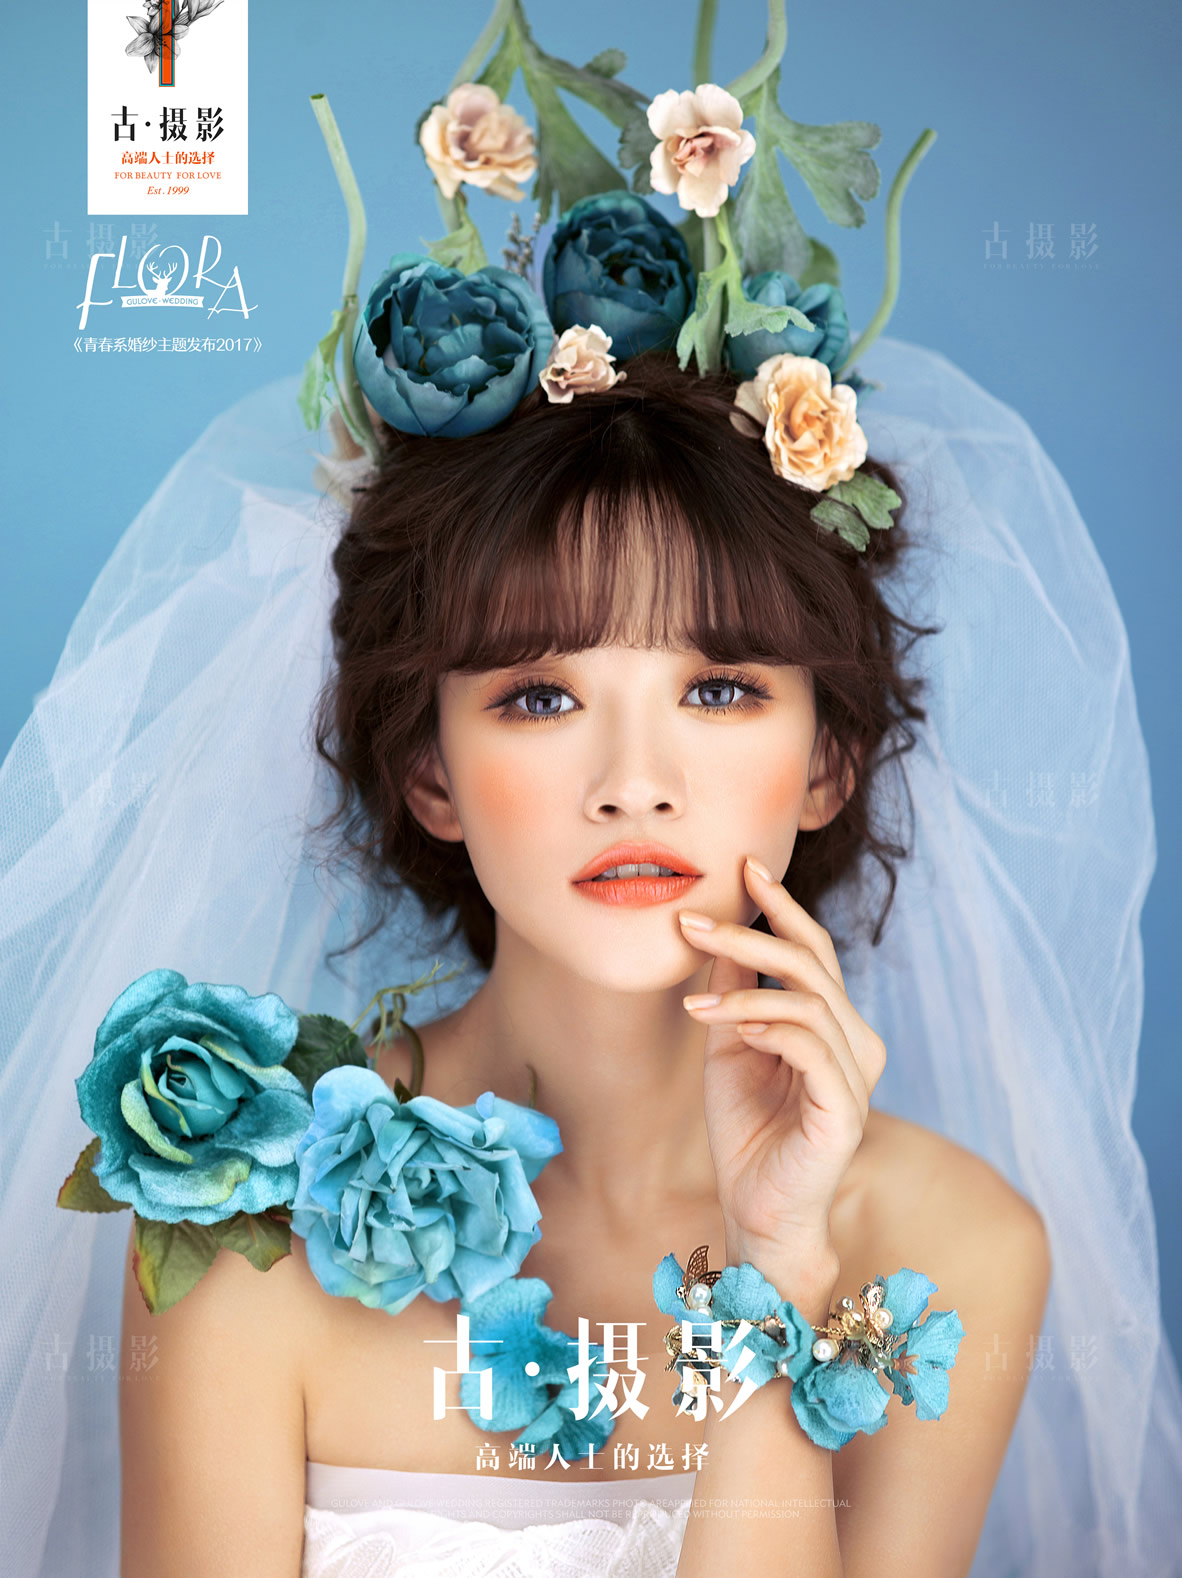 flowers Ⅱ - 明星范 - love昆明古摄影-昆明婚纱摄影网